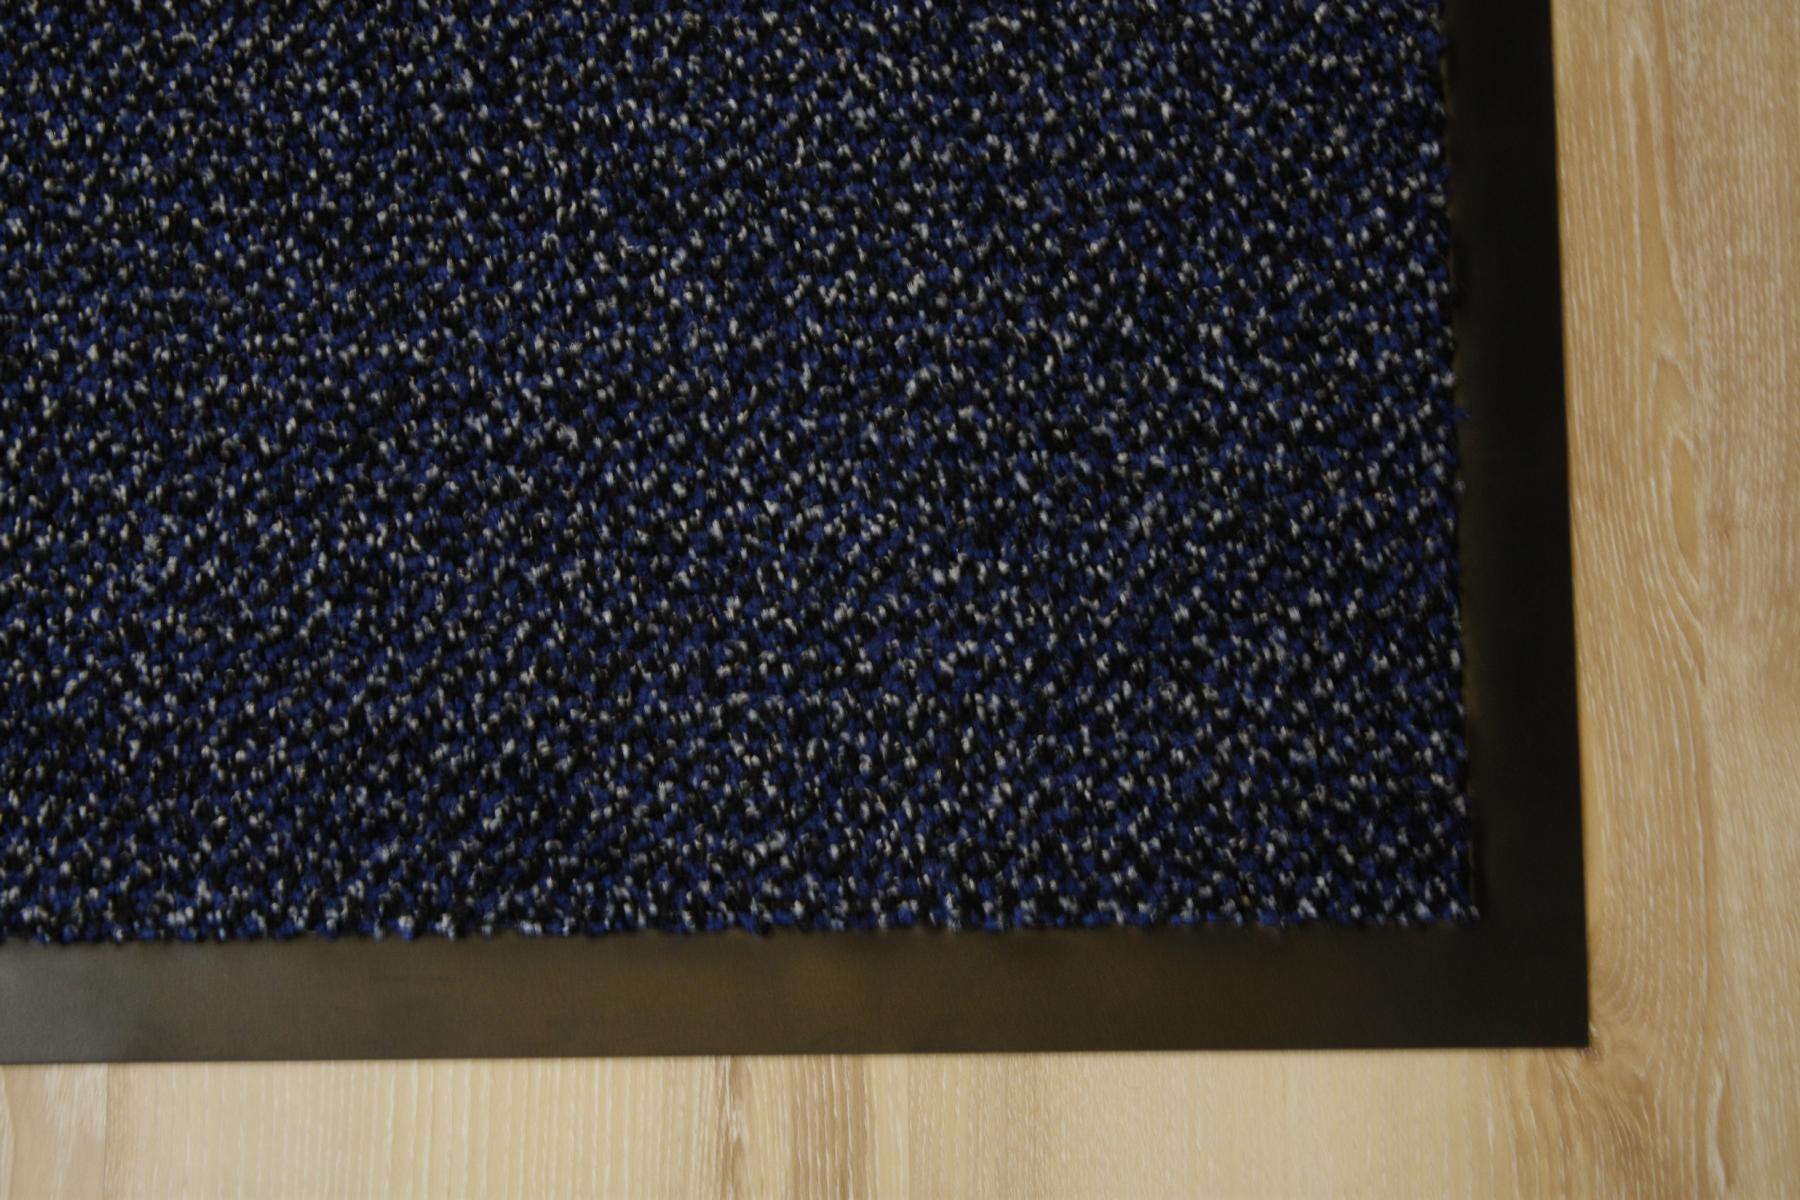 fu matte t rmatte astra graphit 20 blau 60x90 cm ebay. Black Bedroom Furniture Sets. Home Design Ideas